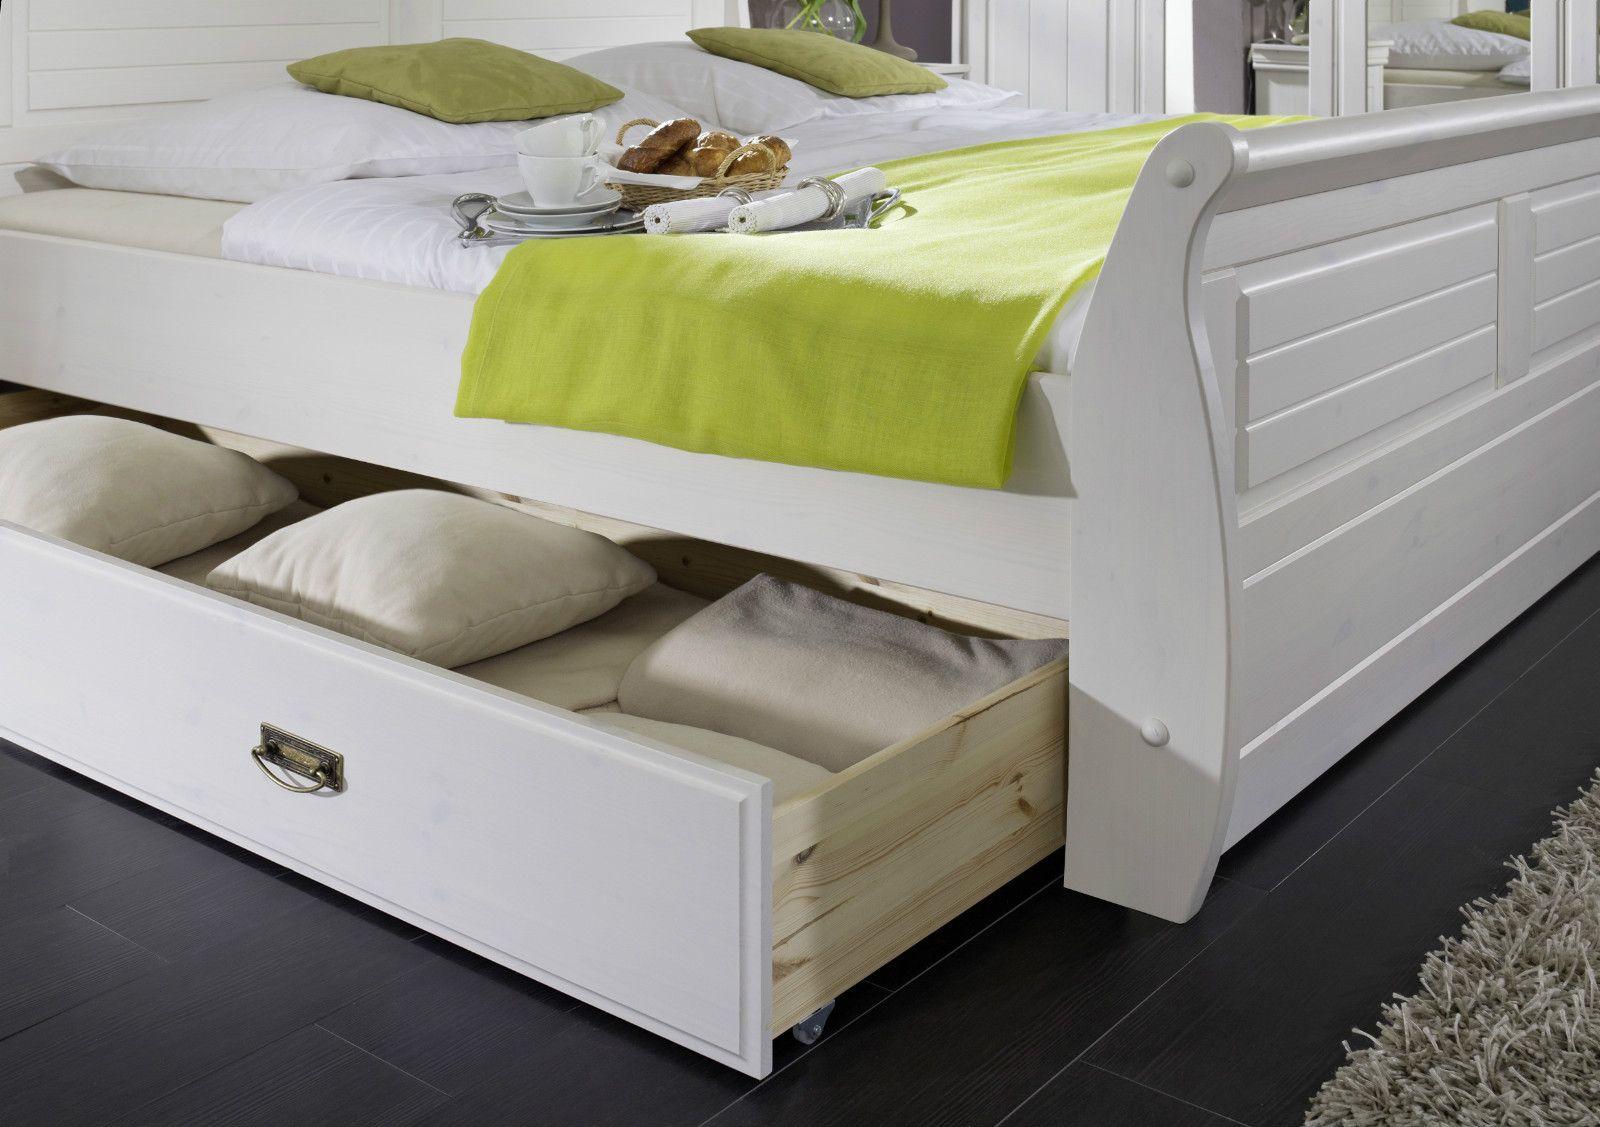 Schlafzimmer Kiefer ~ Bett kiefer massiv gros schlafzimmer ] massive